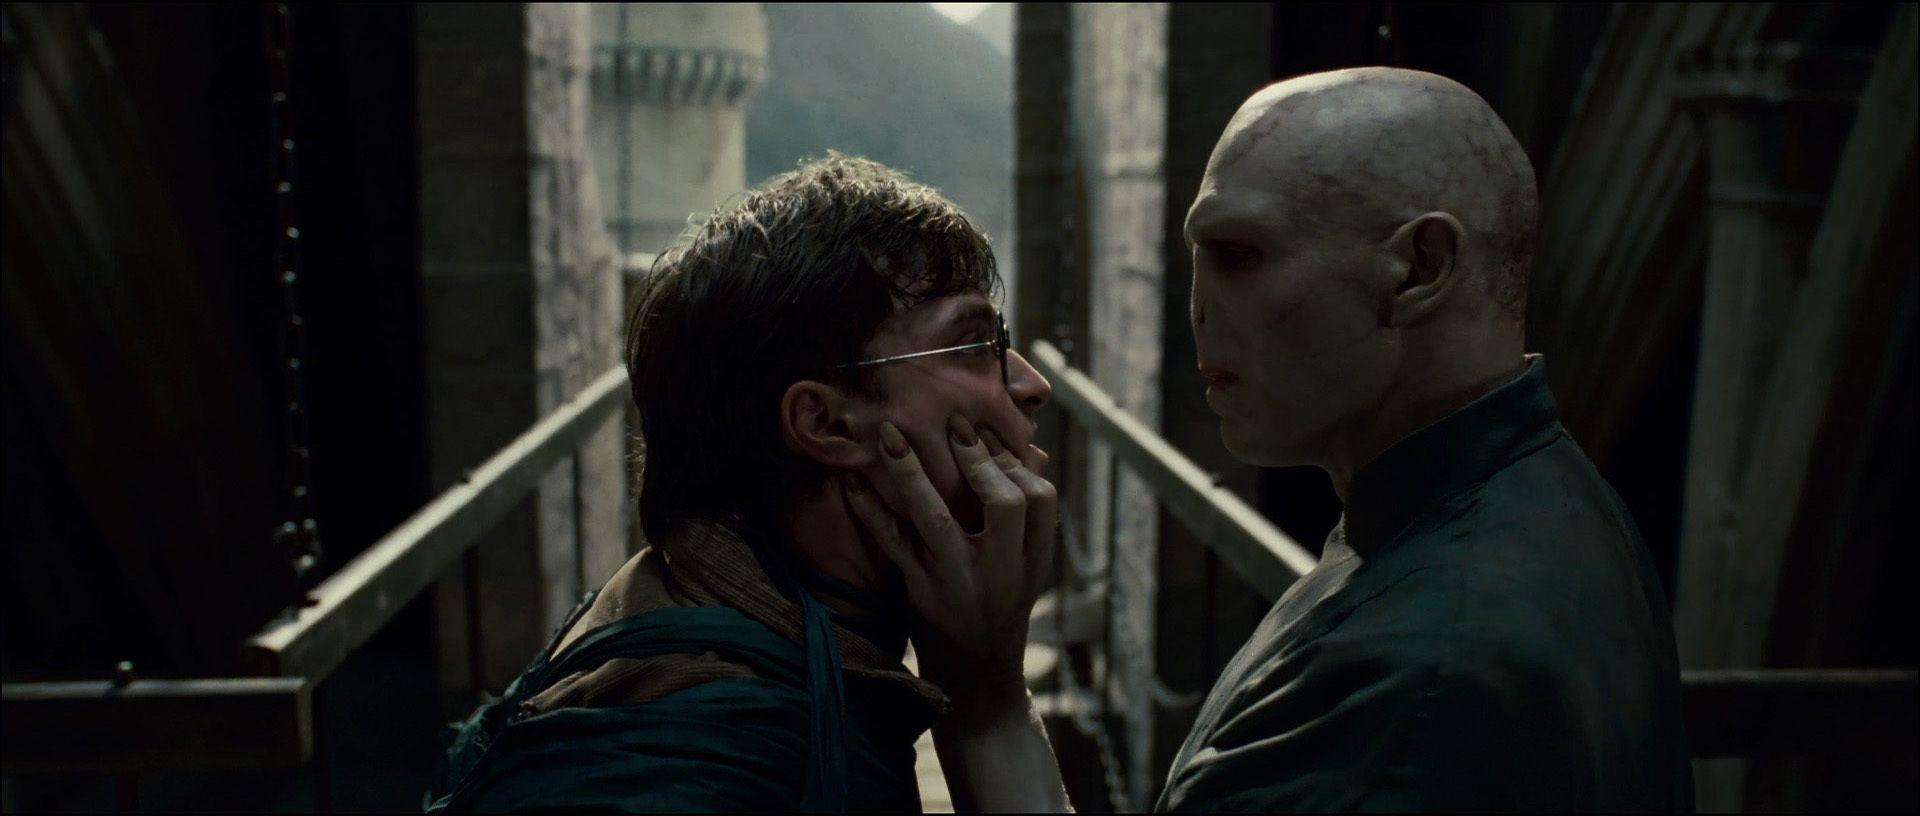 Image result for harry potter scenes